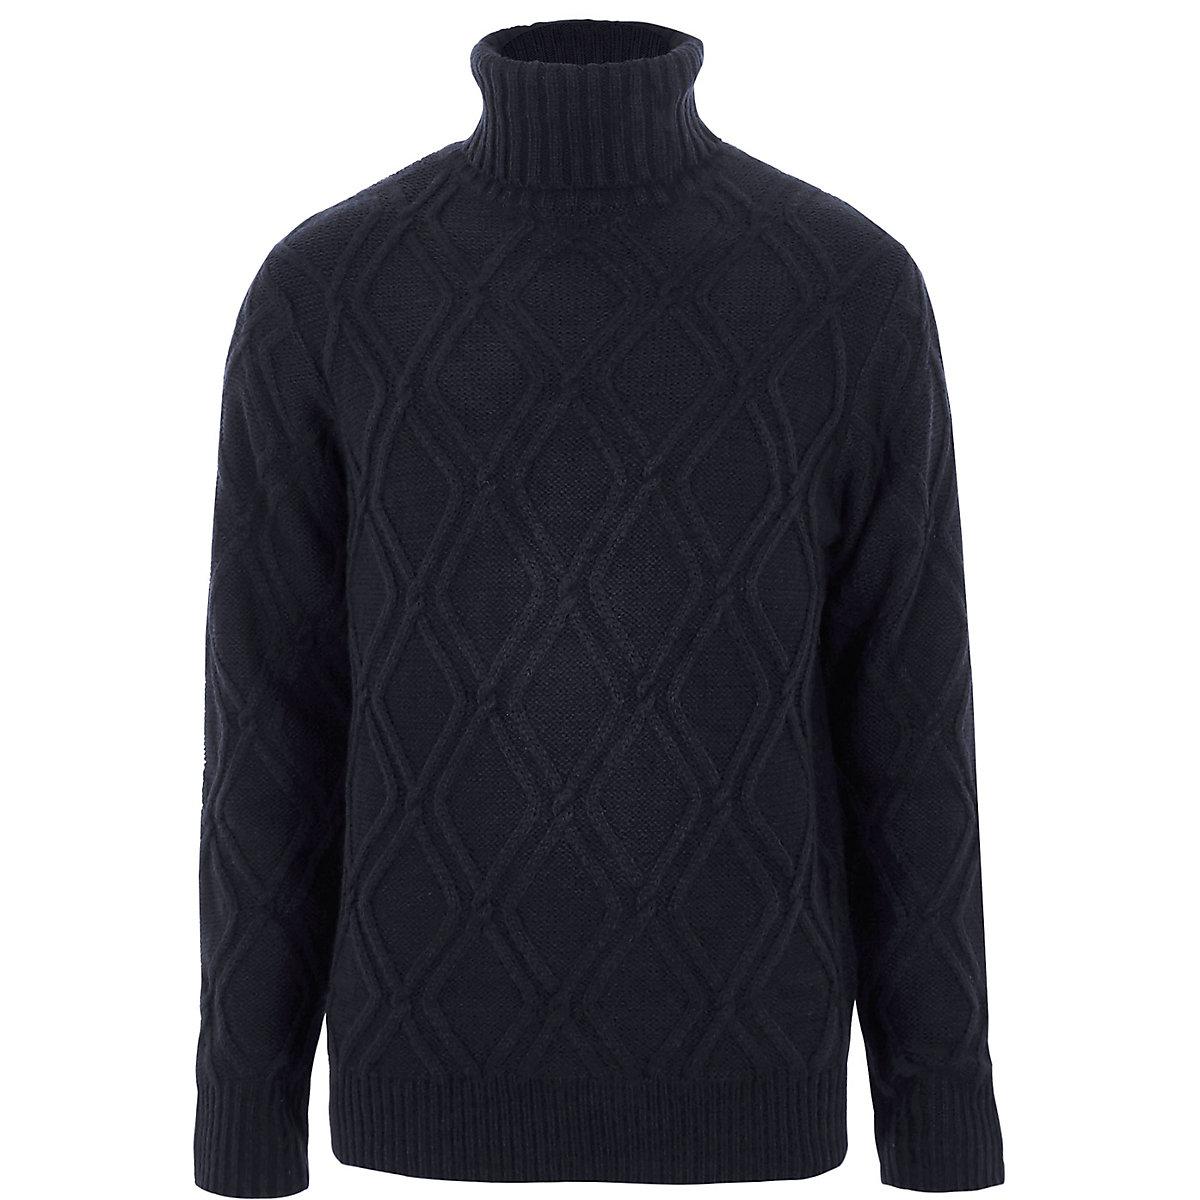 Navy diamond knit roll neck sweater